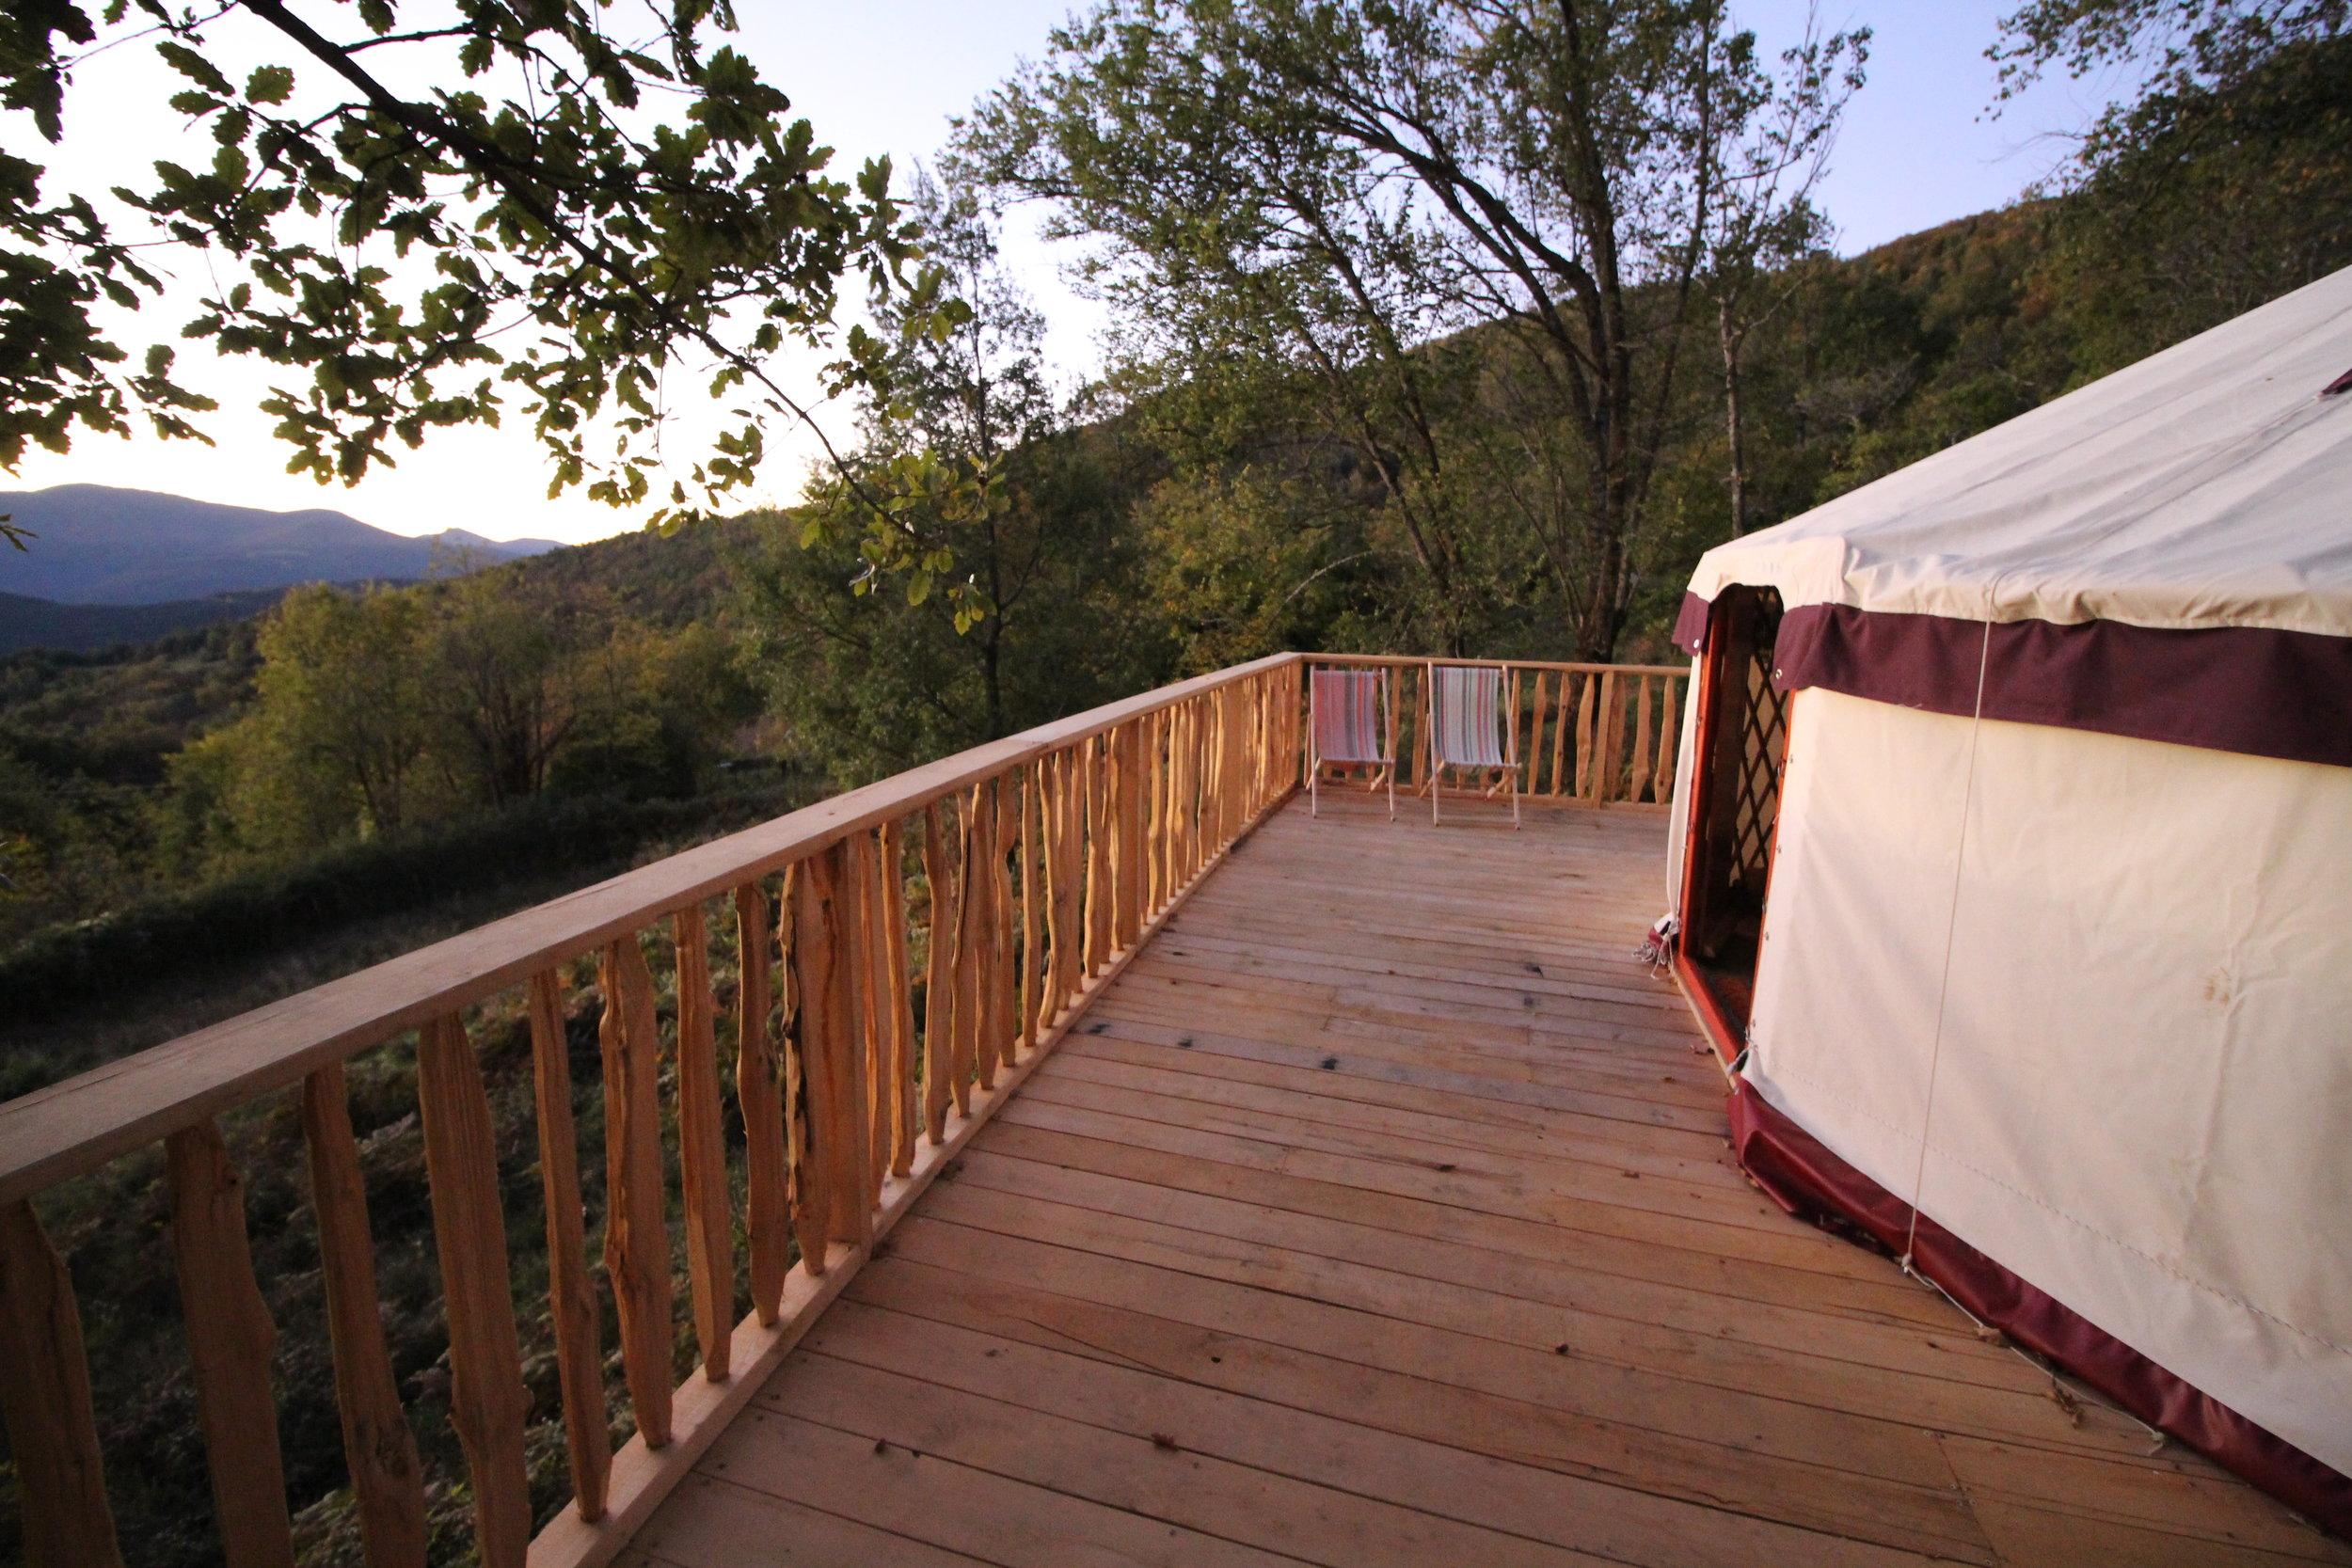 Yurt platform & railings